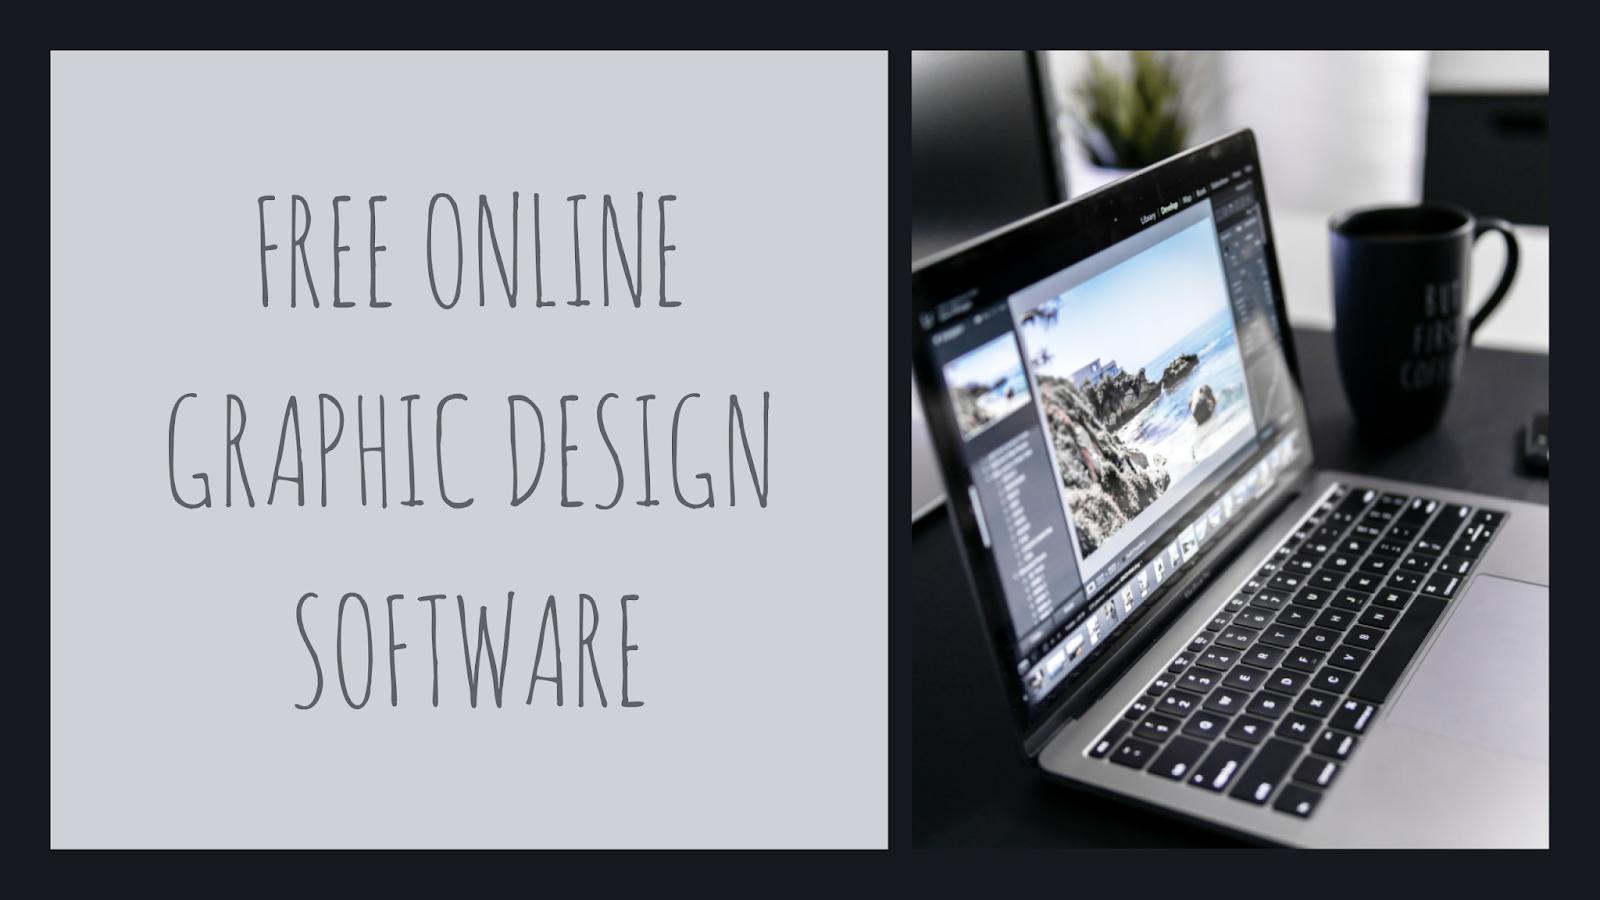 Top 8 Best Free Online Graphic Design Software For Beginners 2020 Techsawft